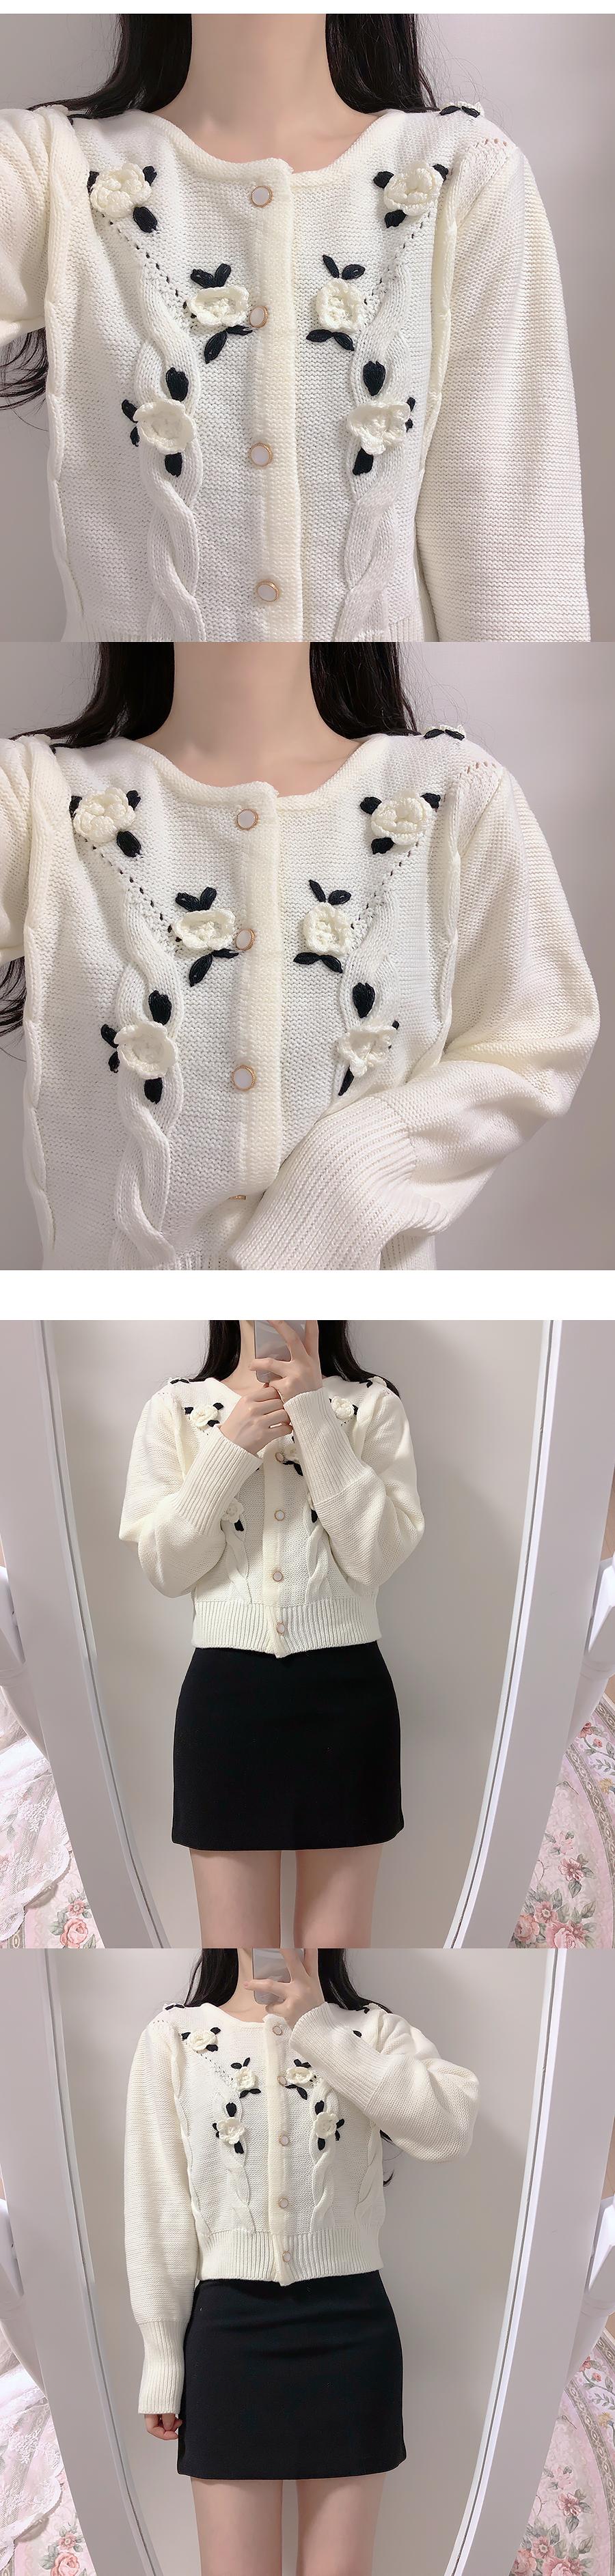 Mimi flower knit cardigan